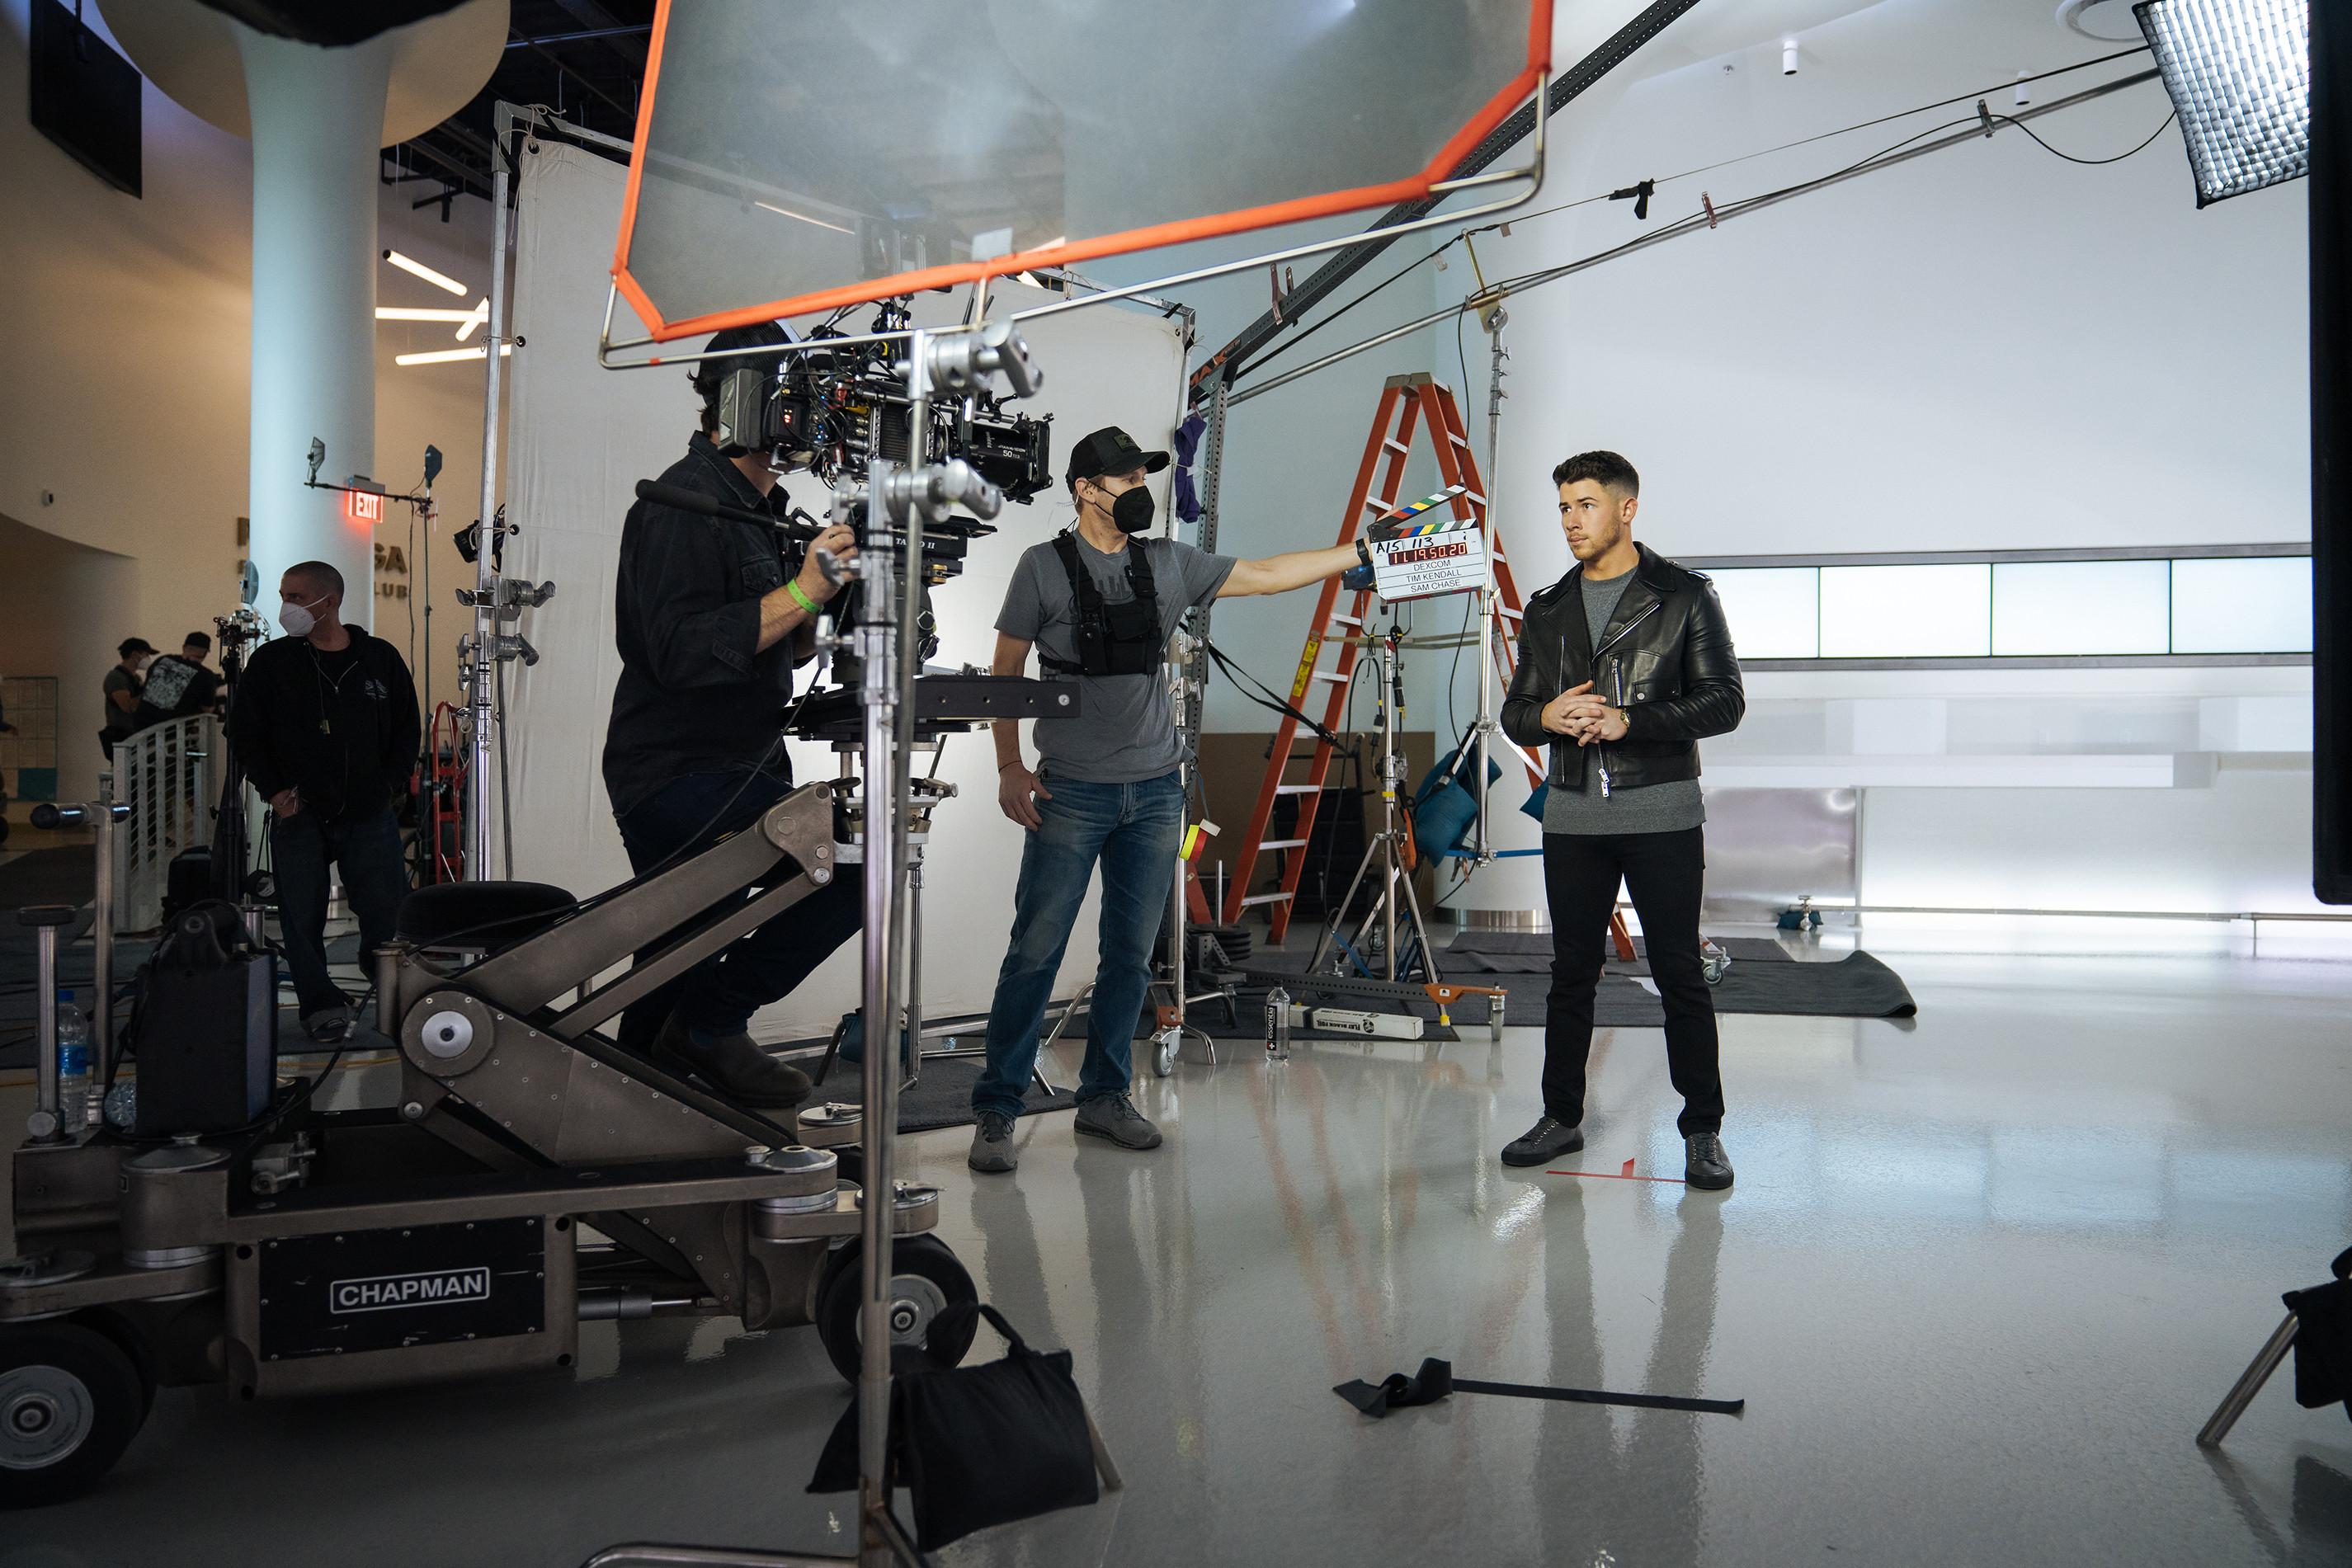 Film / Videography